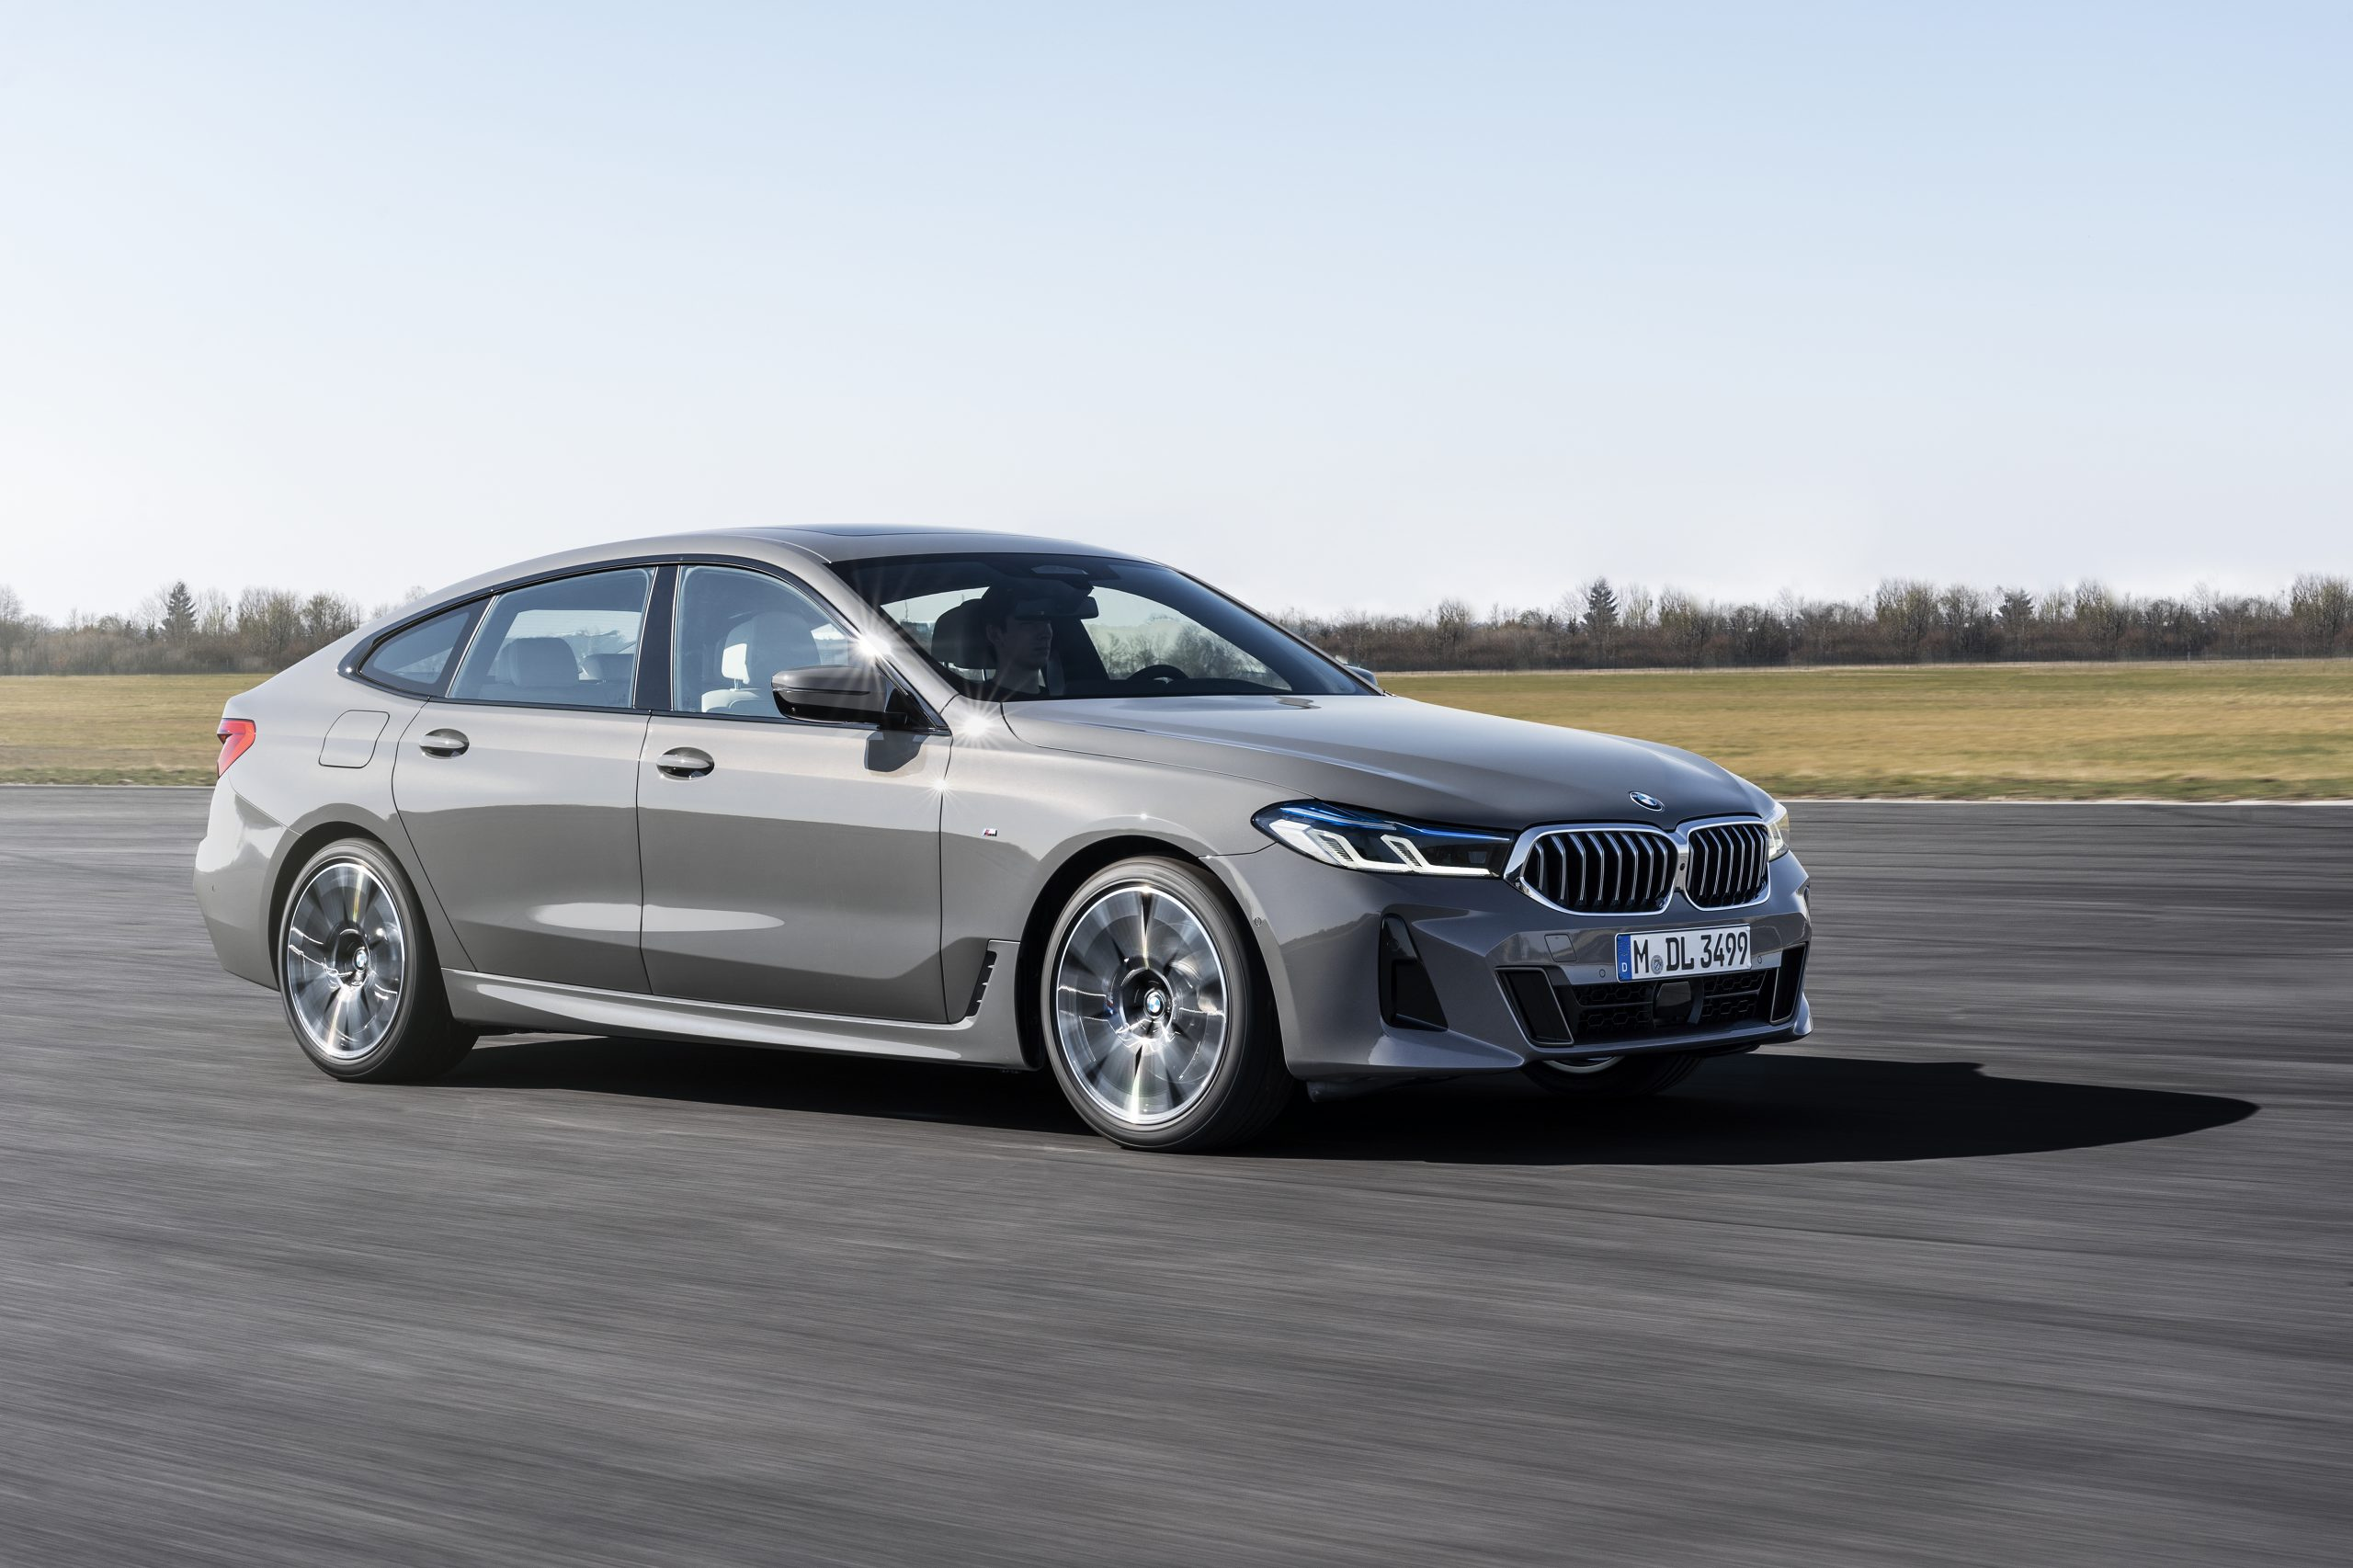 De BMW 6 Serie Gran Turismo